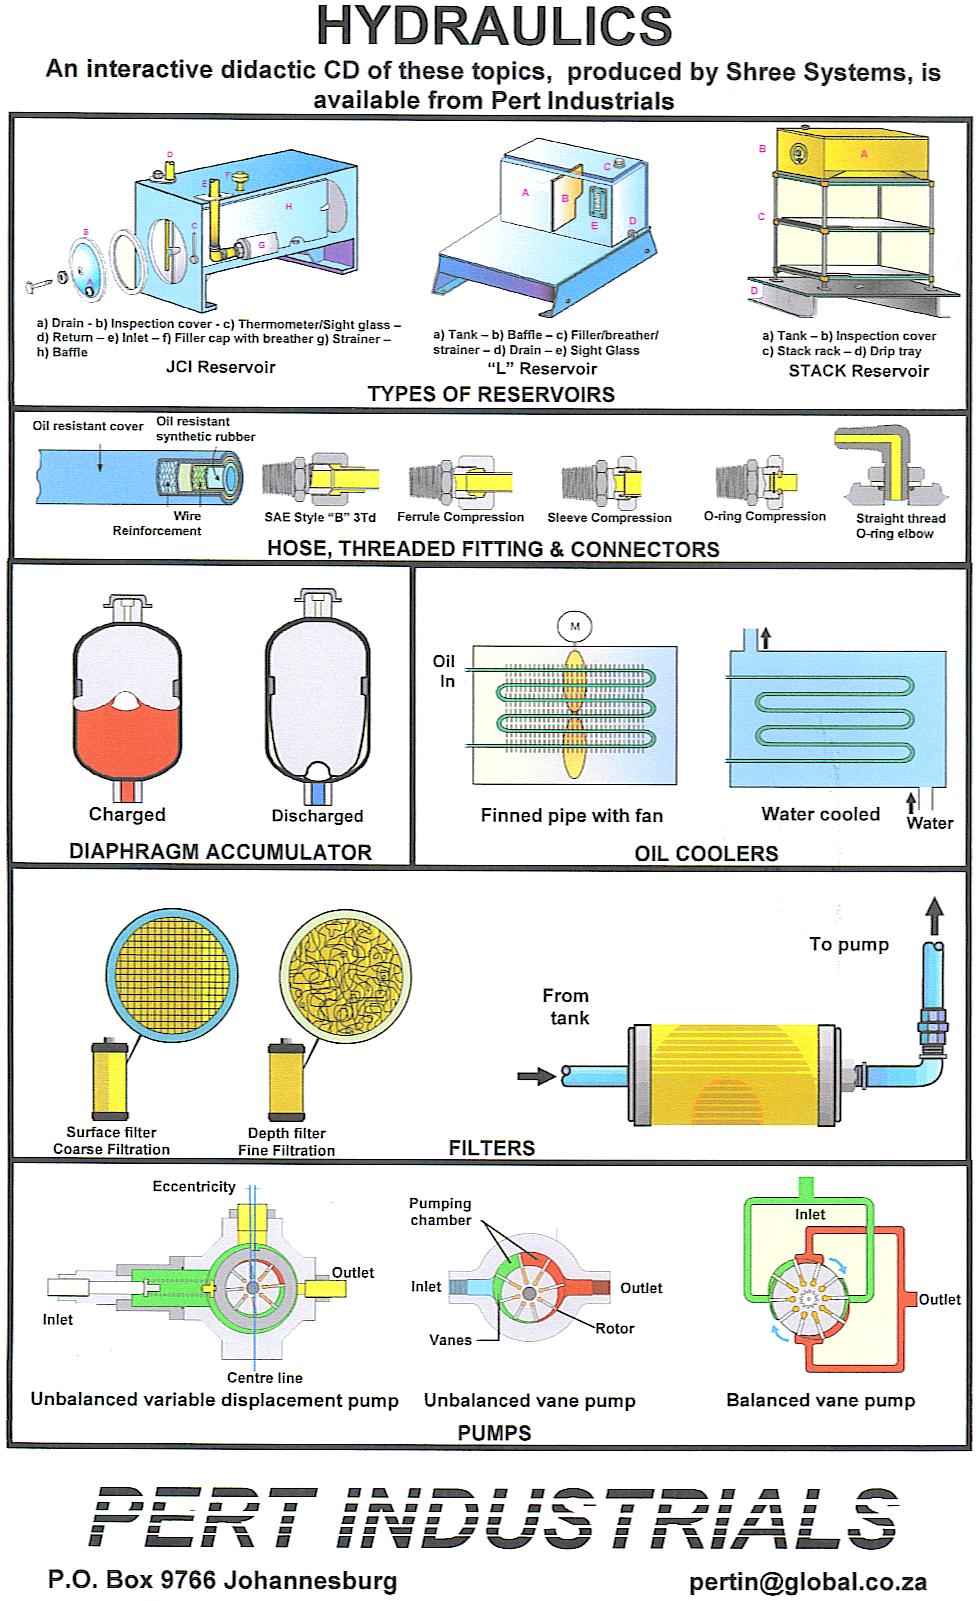 HP4-2 Hydraulics Wall Chart.png